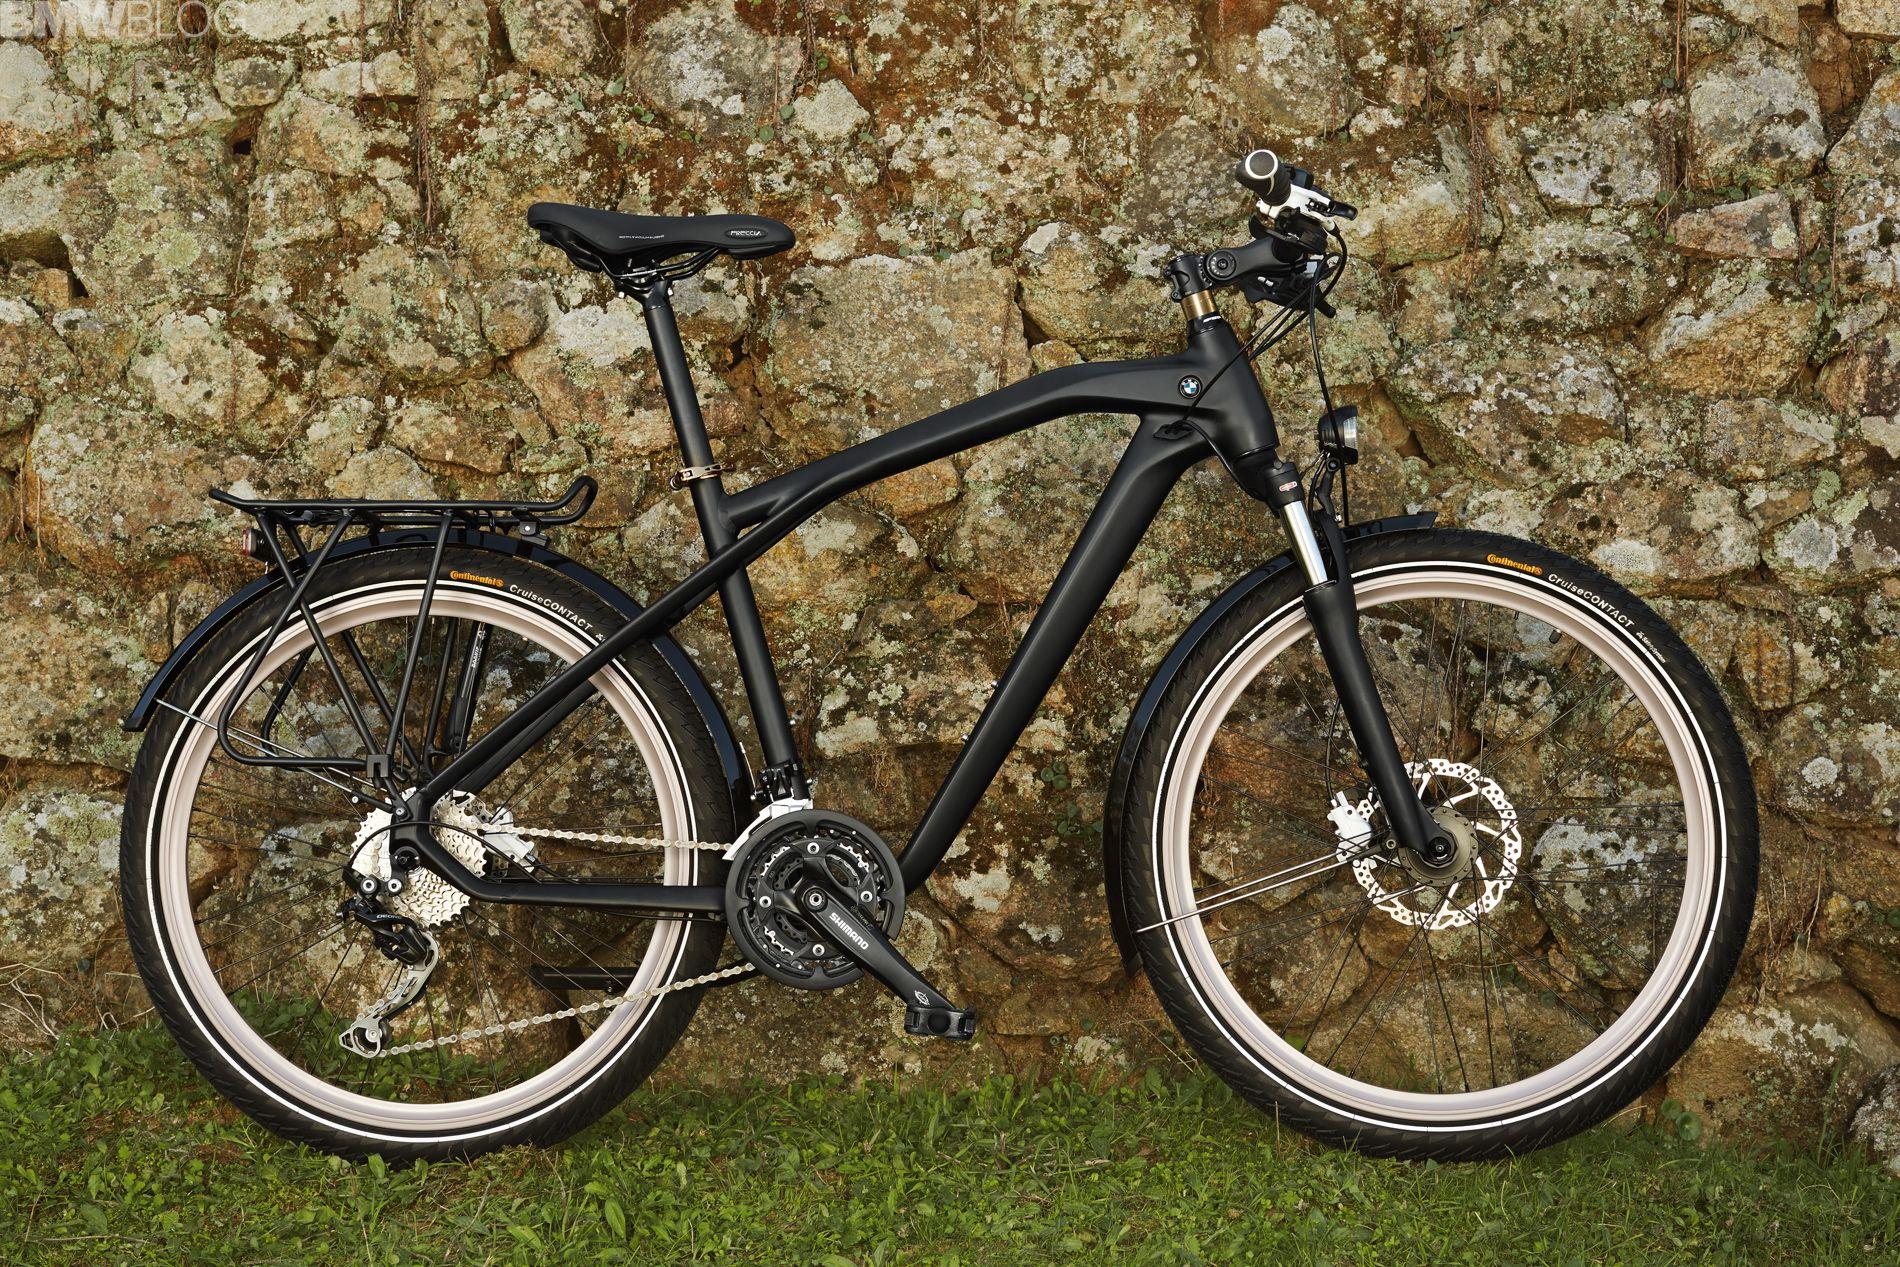 BMW launches new bike collection | bike | Pinterest | BMW